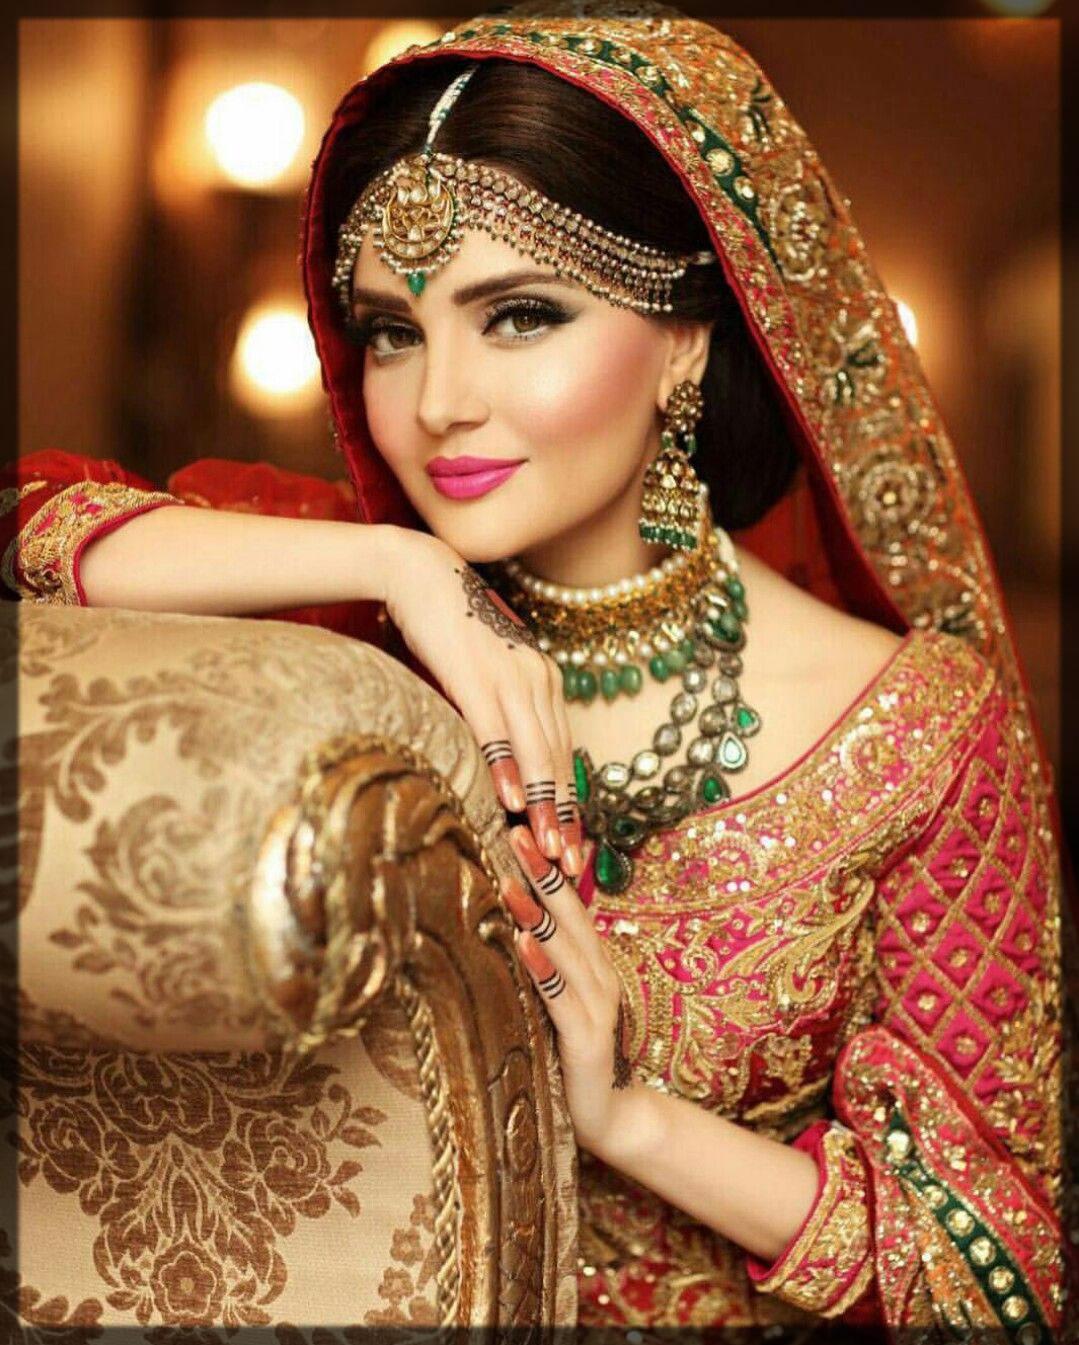 gorgeous armeena khan in head jewelry